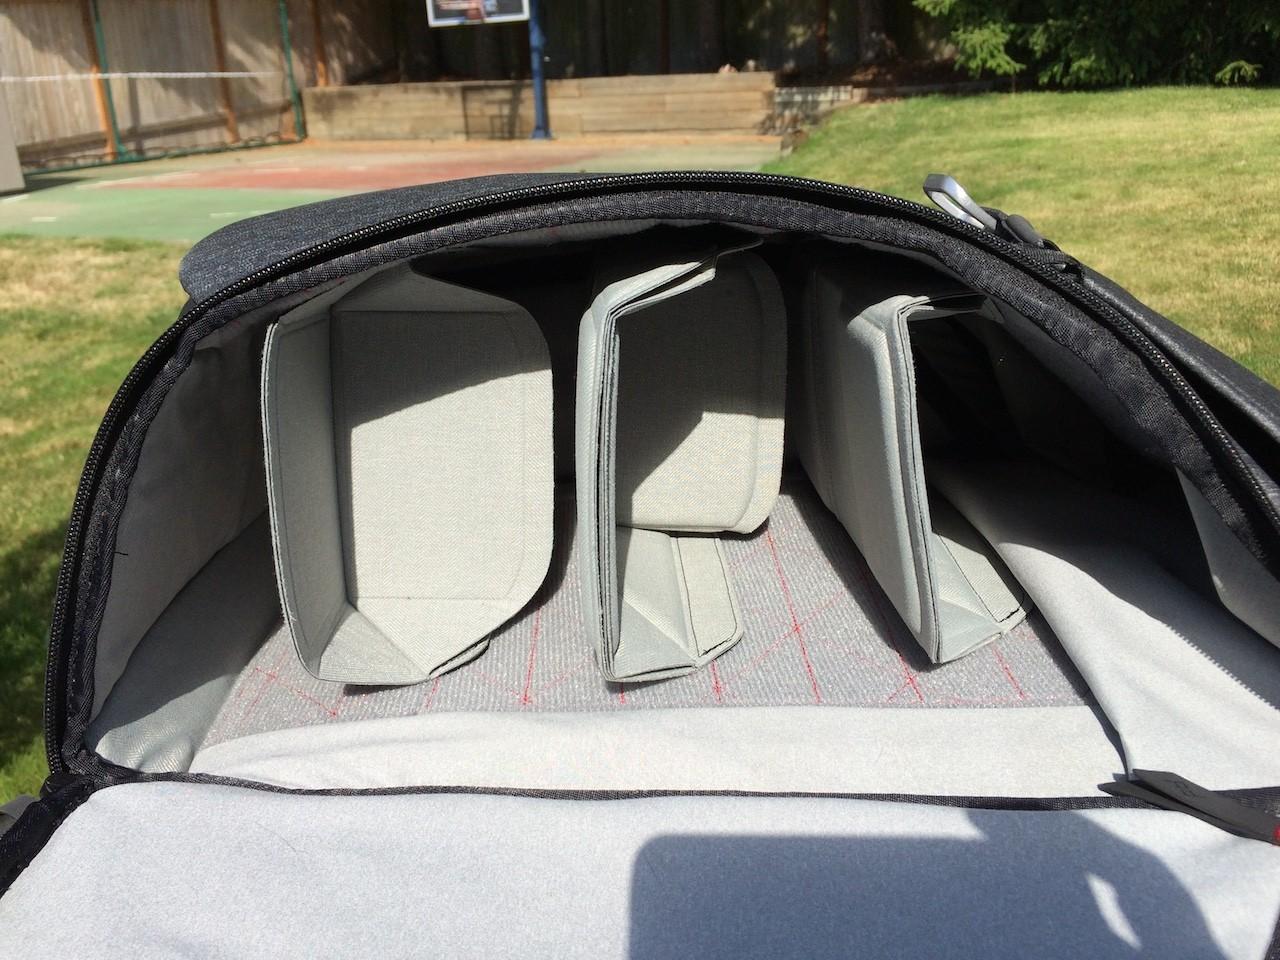 Peak Design Everyday Backpack folding dividers